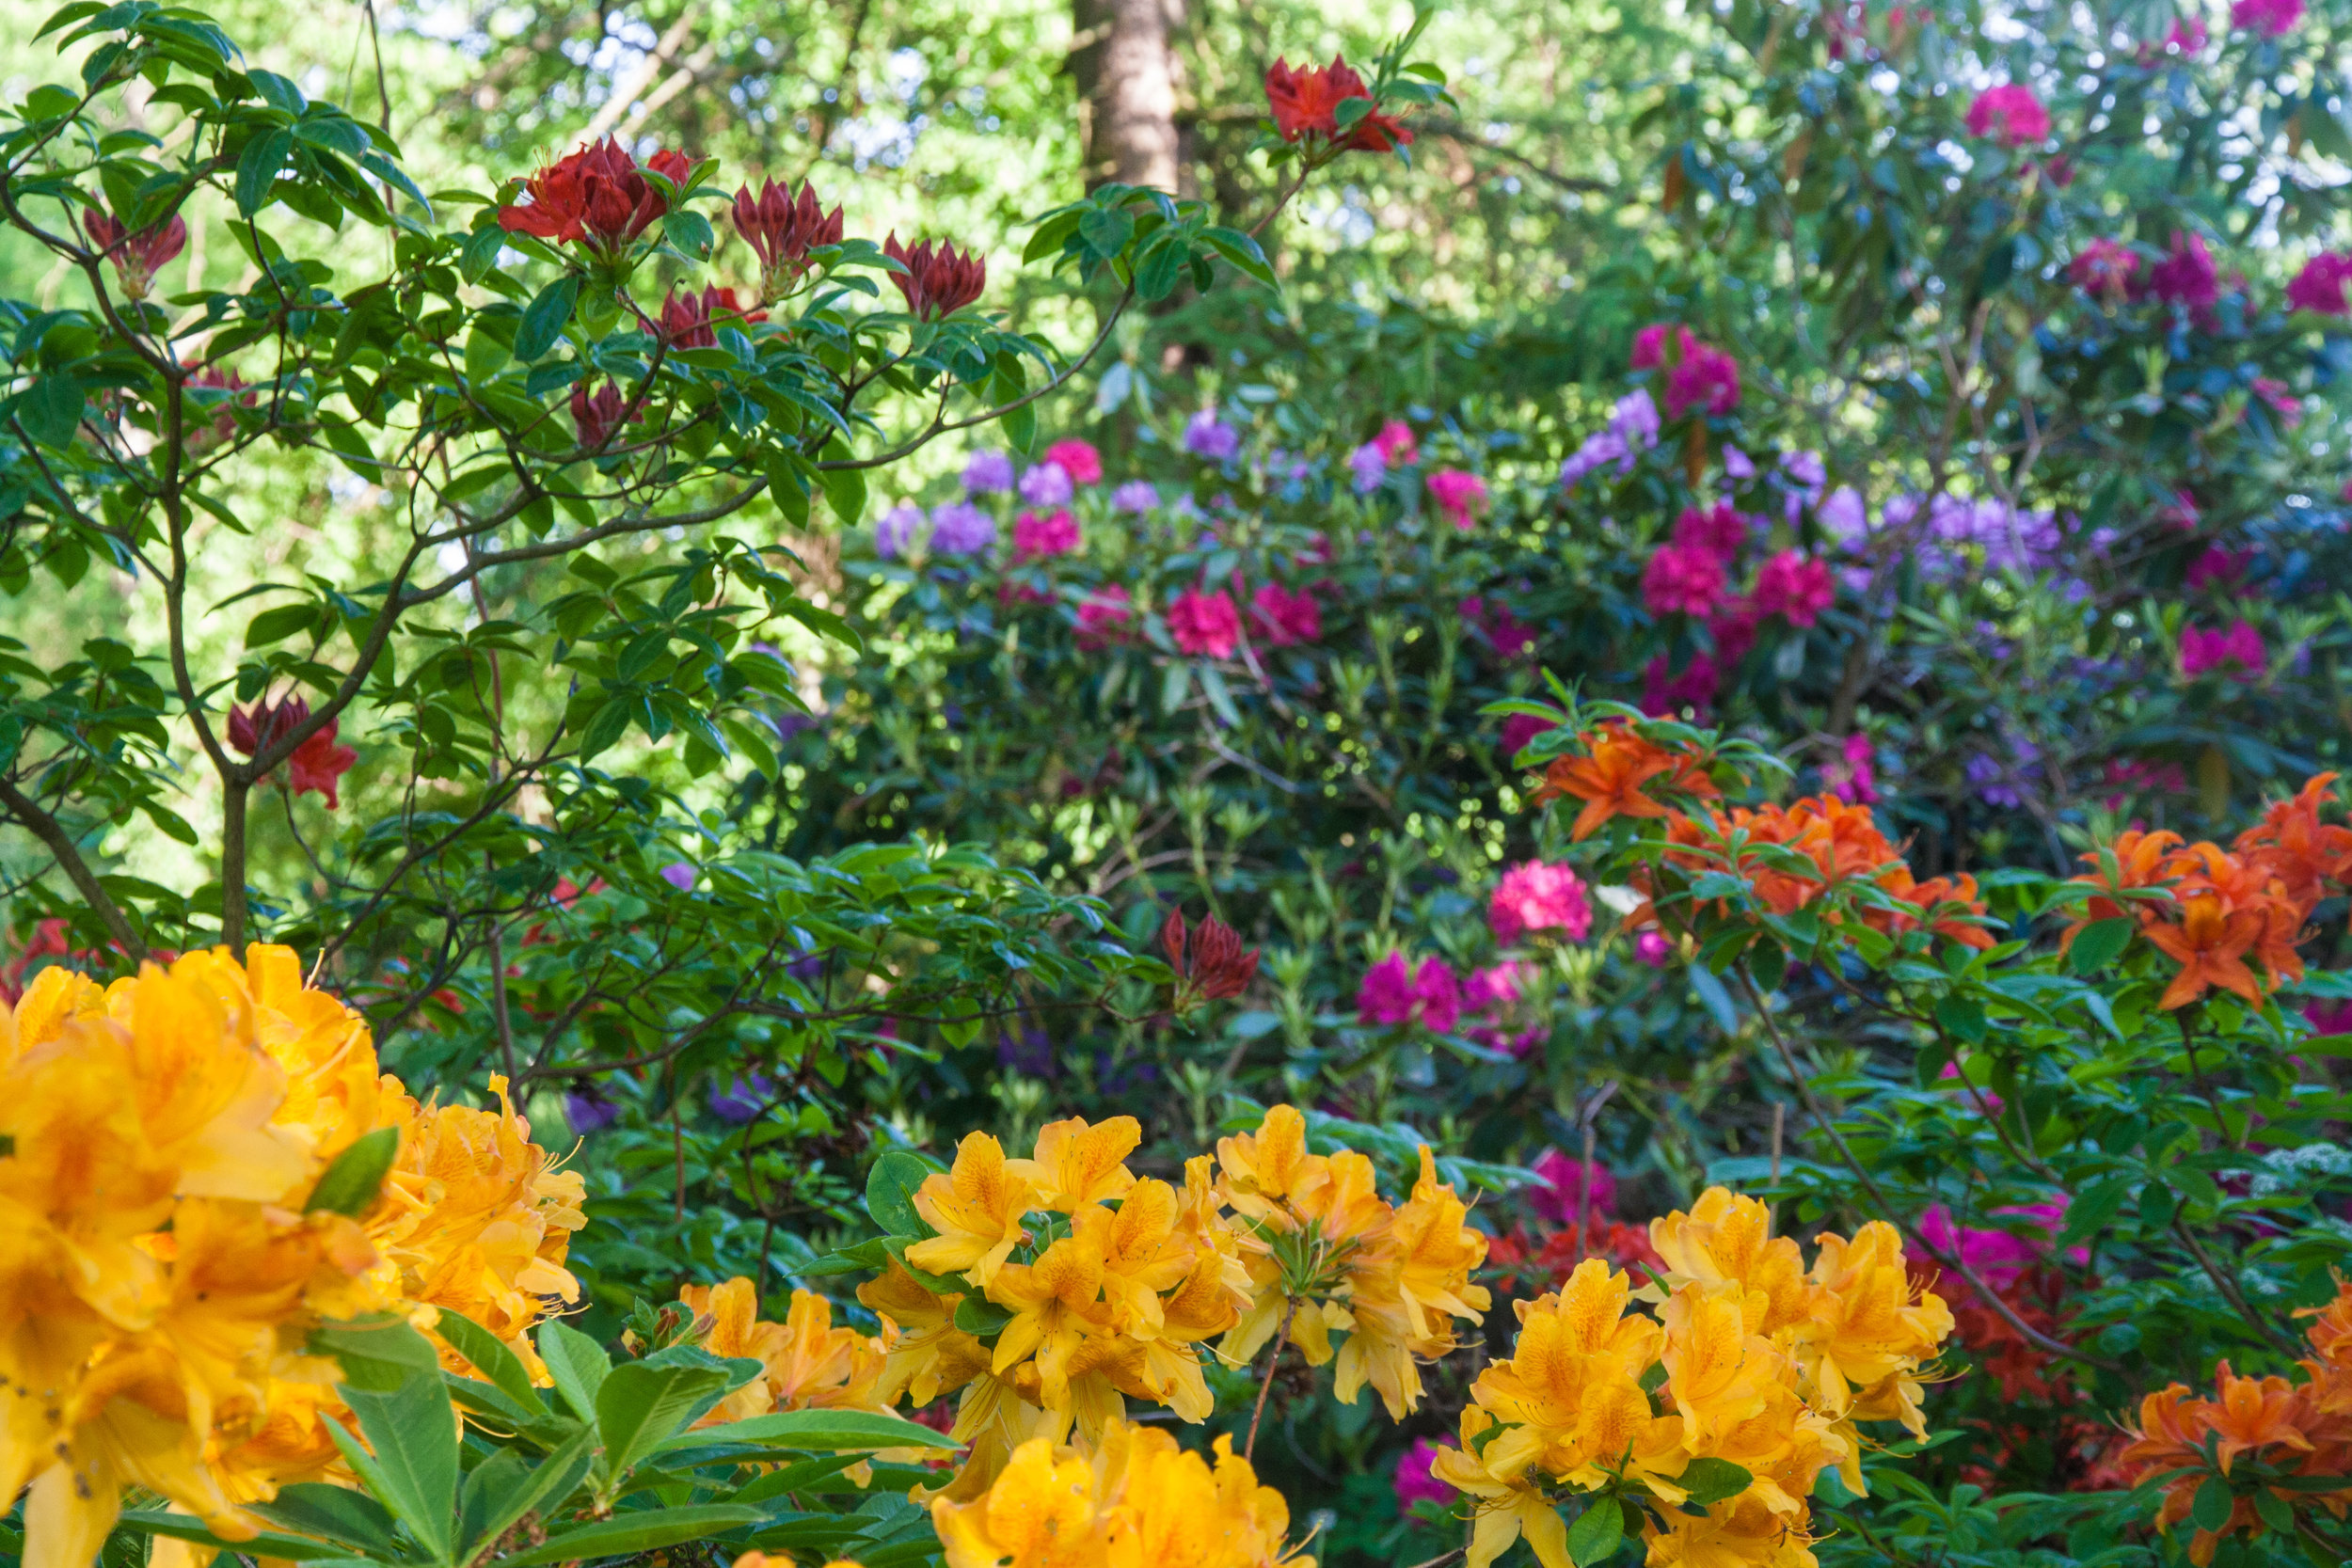 Azalea-rhododendron-Bosjokloster.jpg